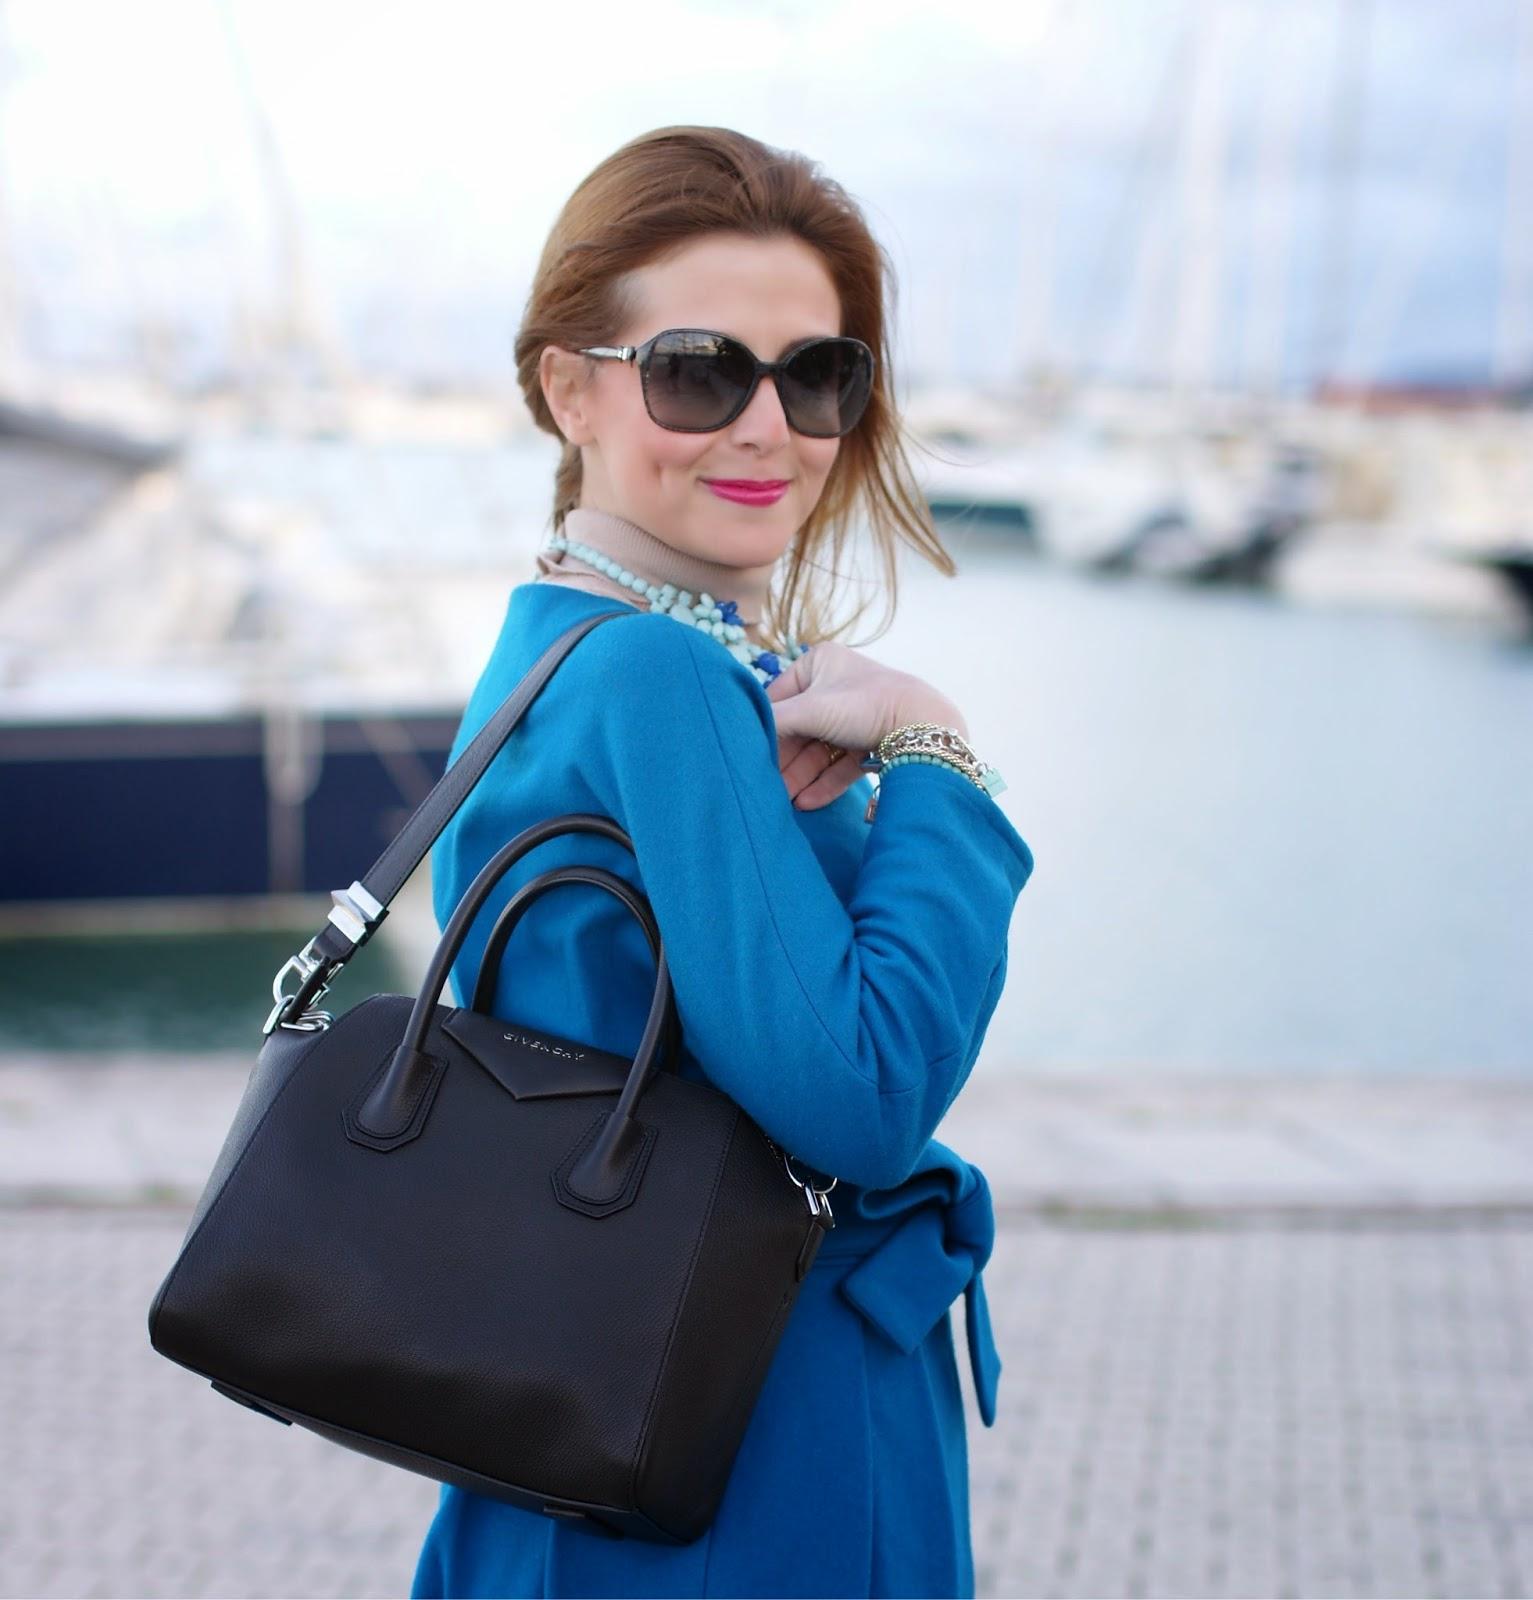 Givenchy Antigona bag, Sapphire blue coat, Fashion and Cookies, fashion blogger